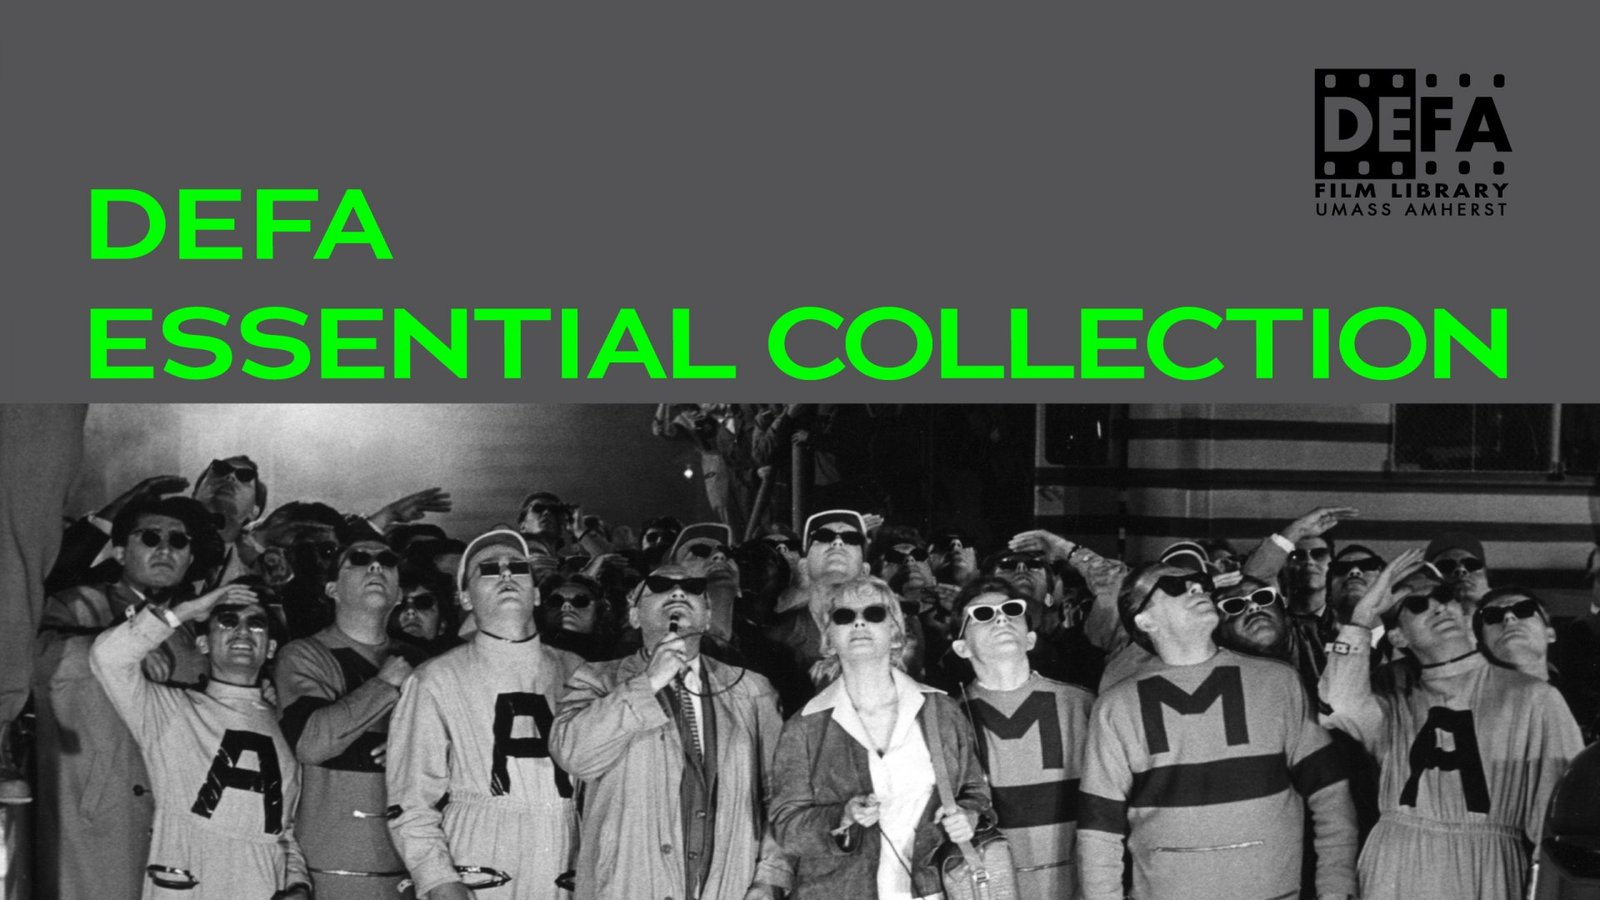 DEFA Essential Collection